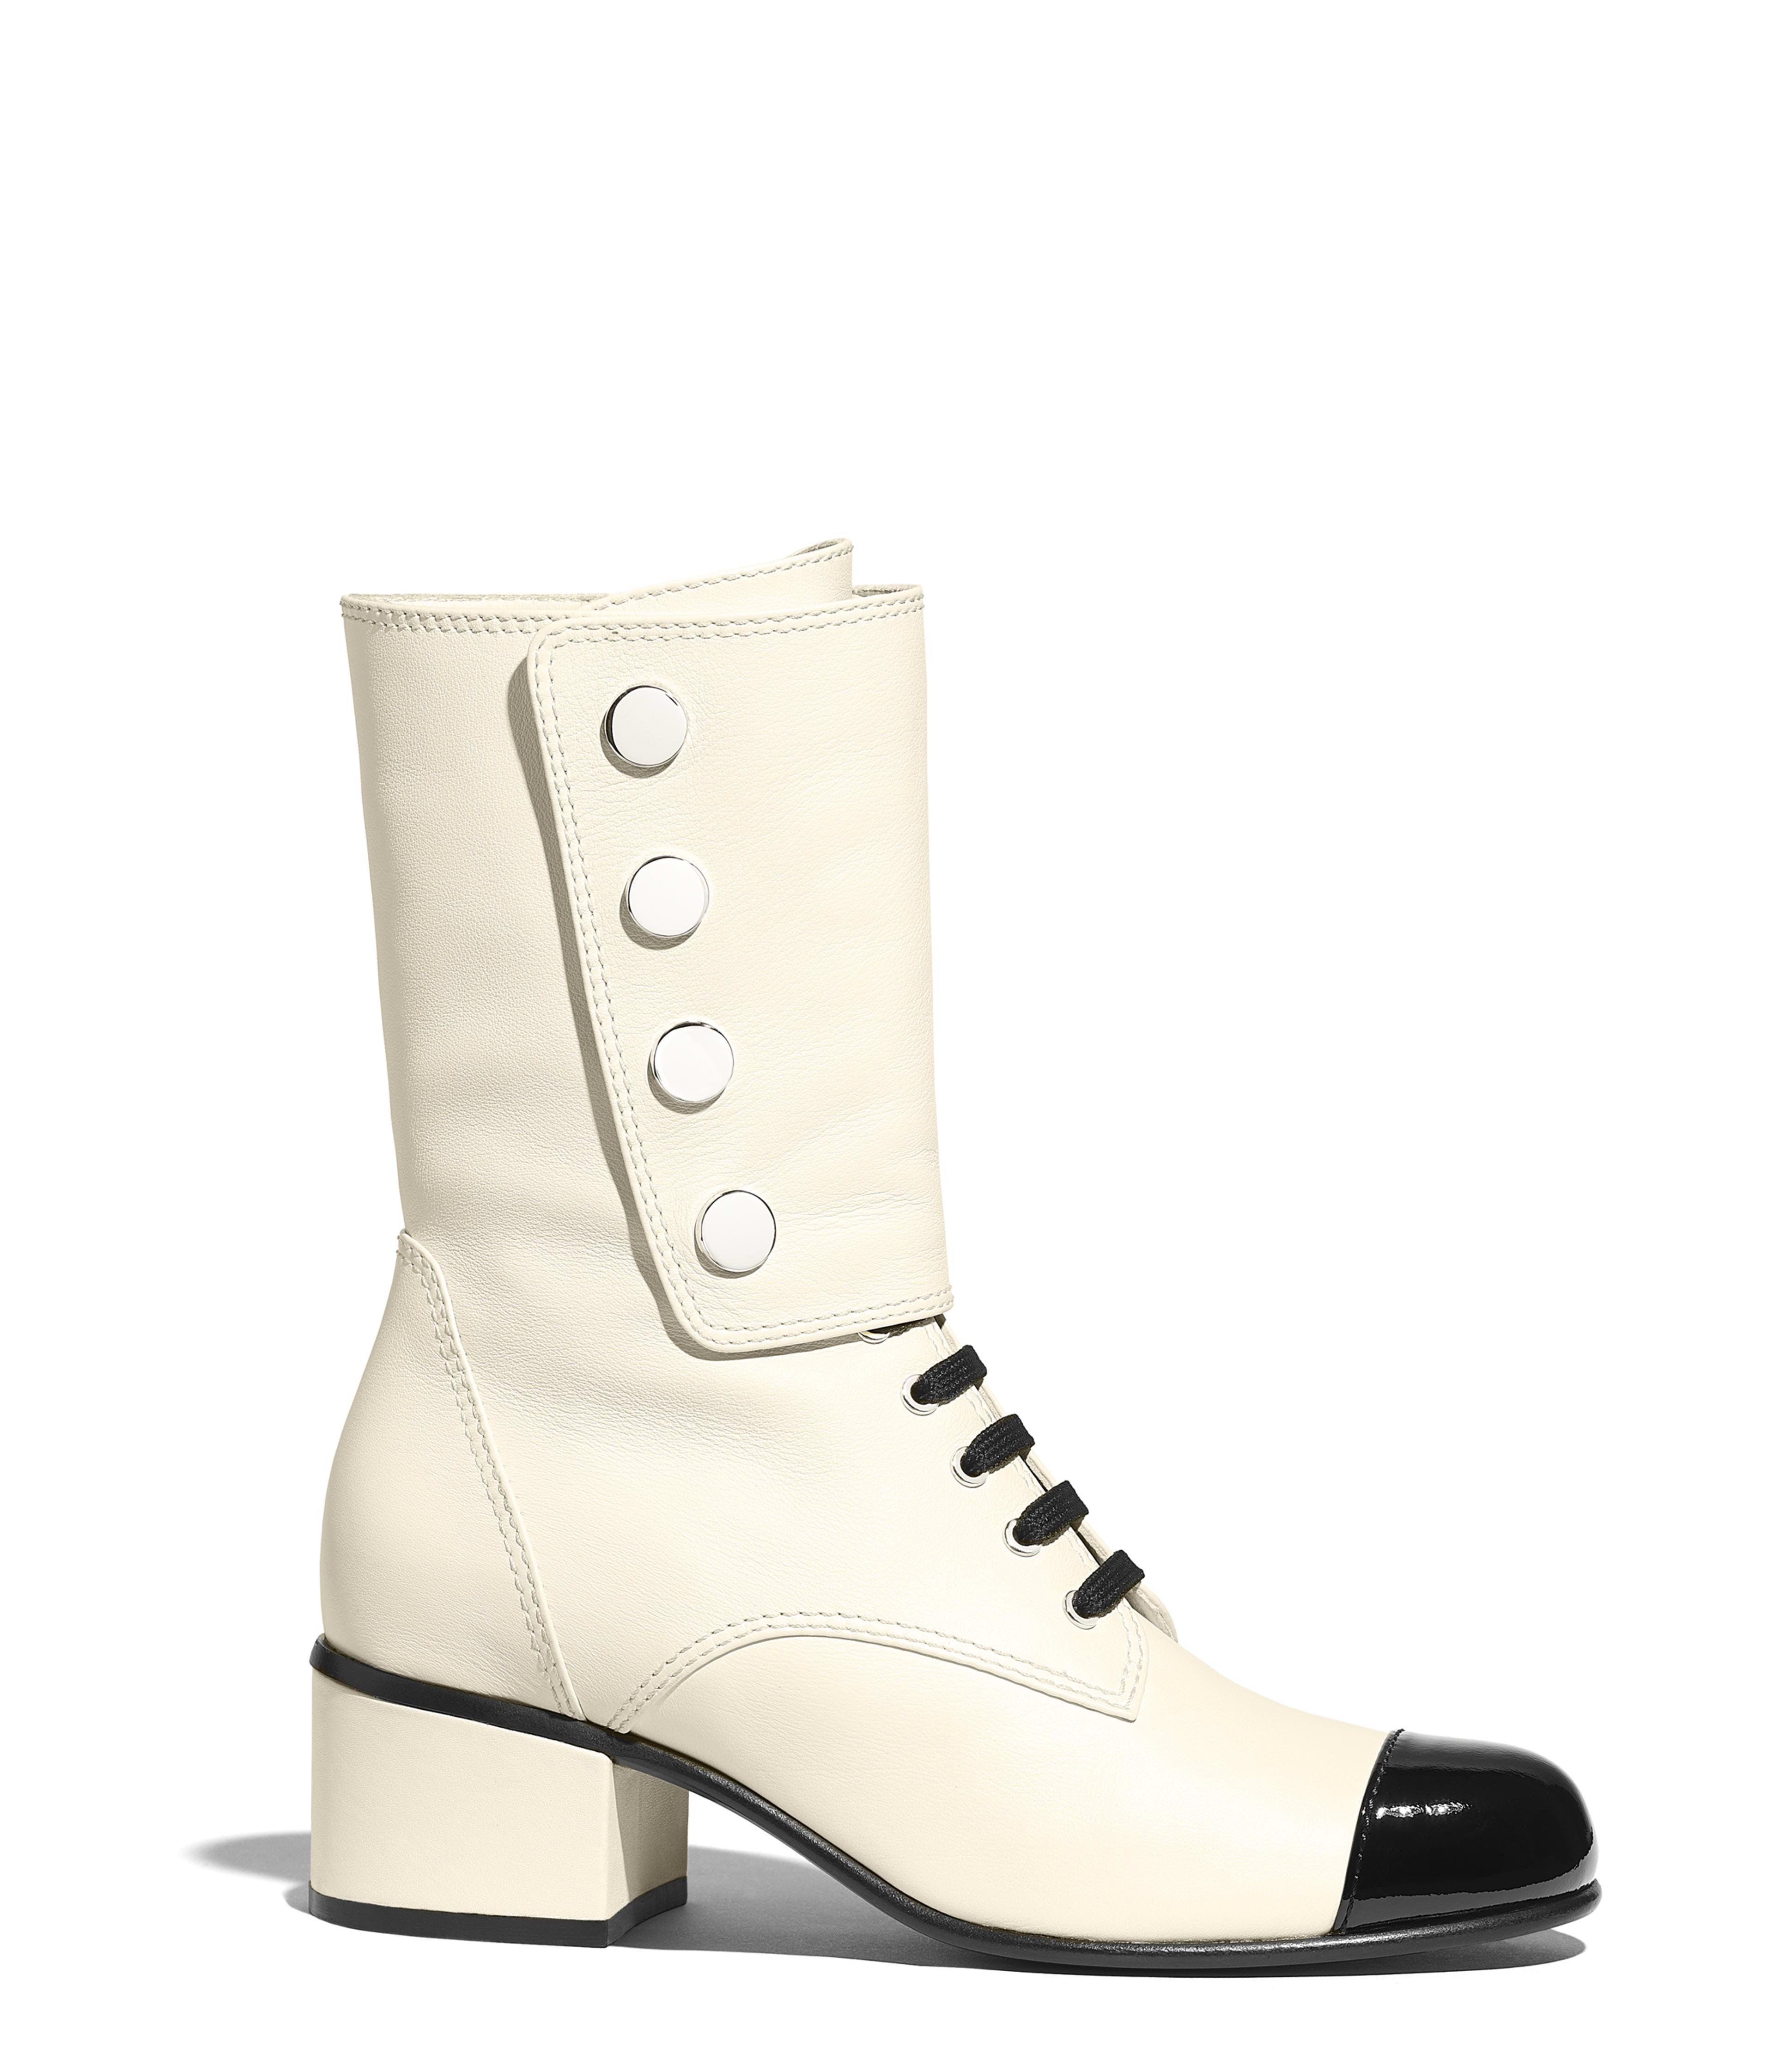 Shoes Fashion Chanel